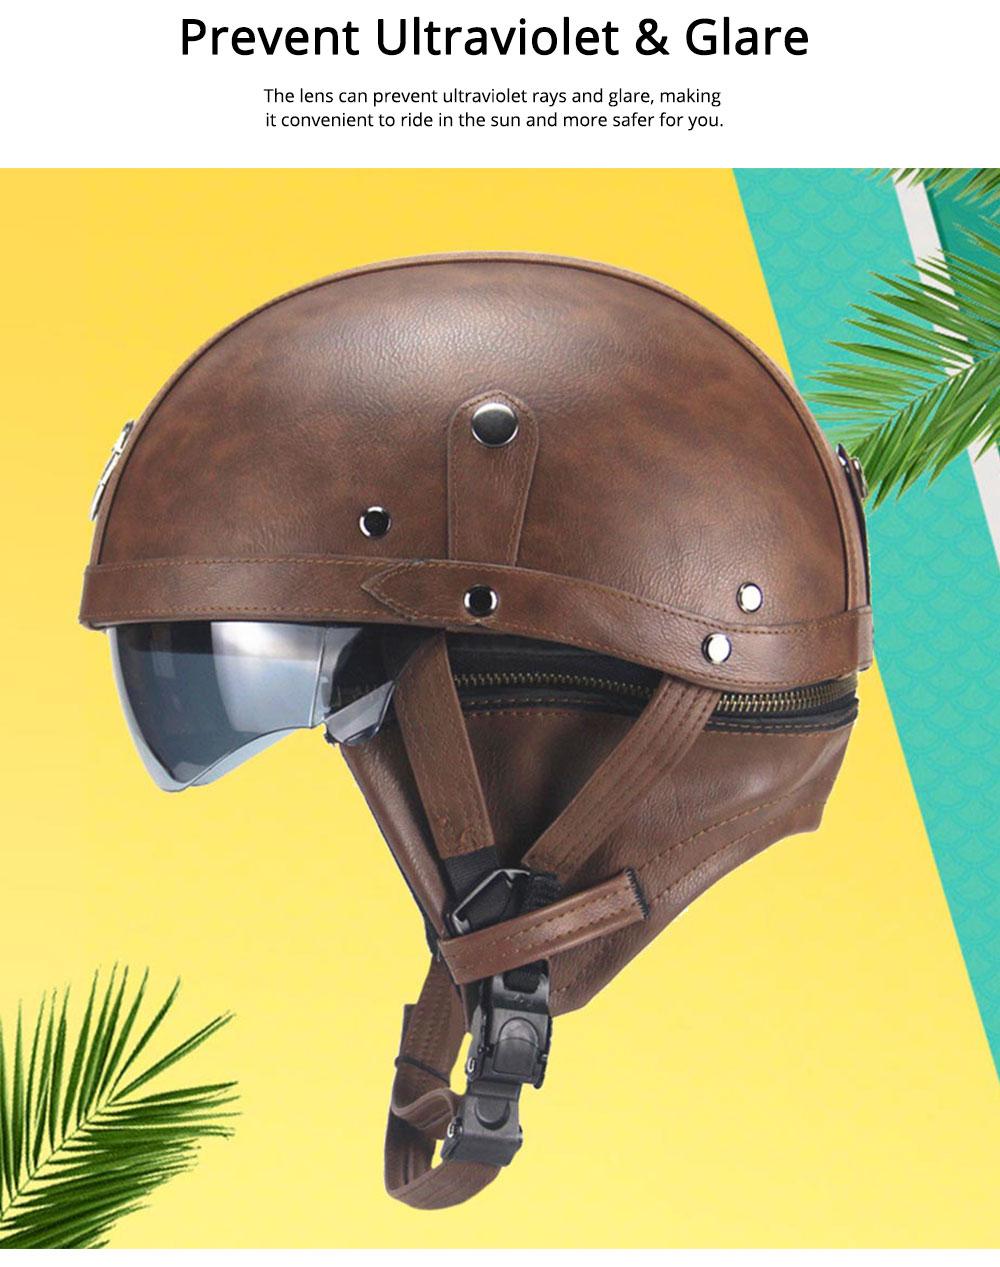 Half-head Helmet ABS PU Material Breathable Buffer Helm Moisture Absorption Headgear Safe for Harley Riding for Men Women Anti-ultraviolet Cap Anti-glare Headpiece Safe Hat 5